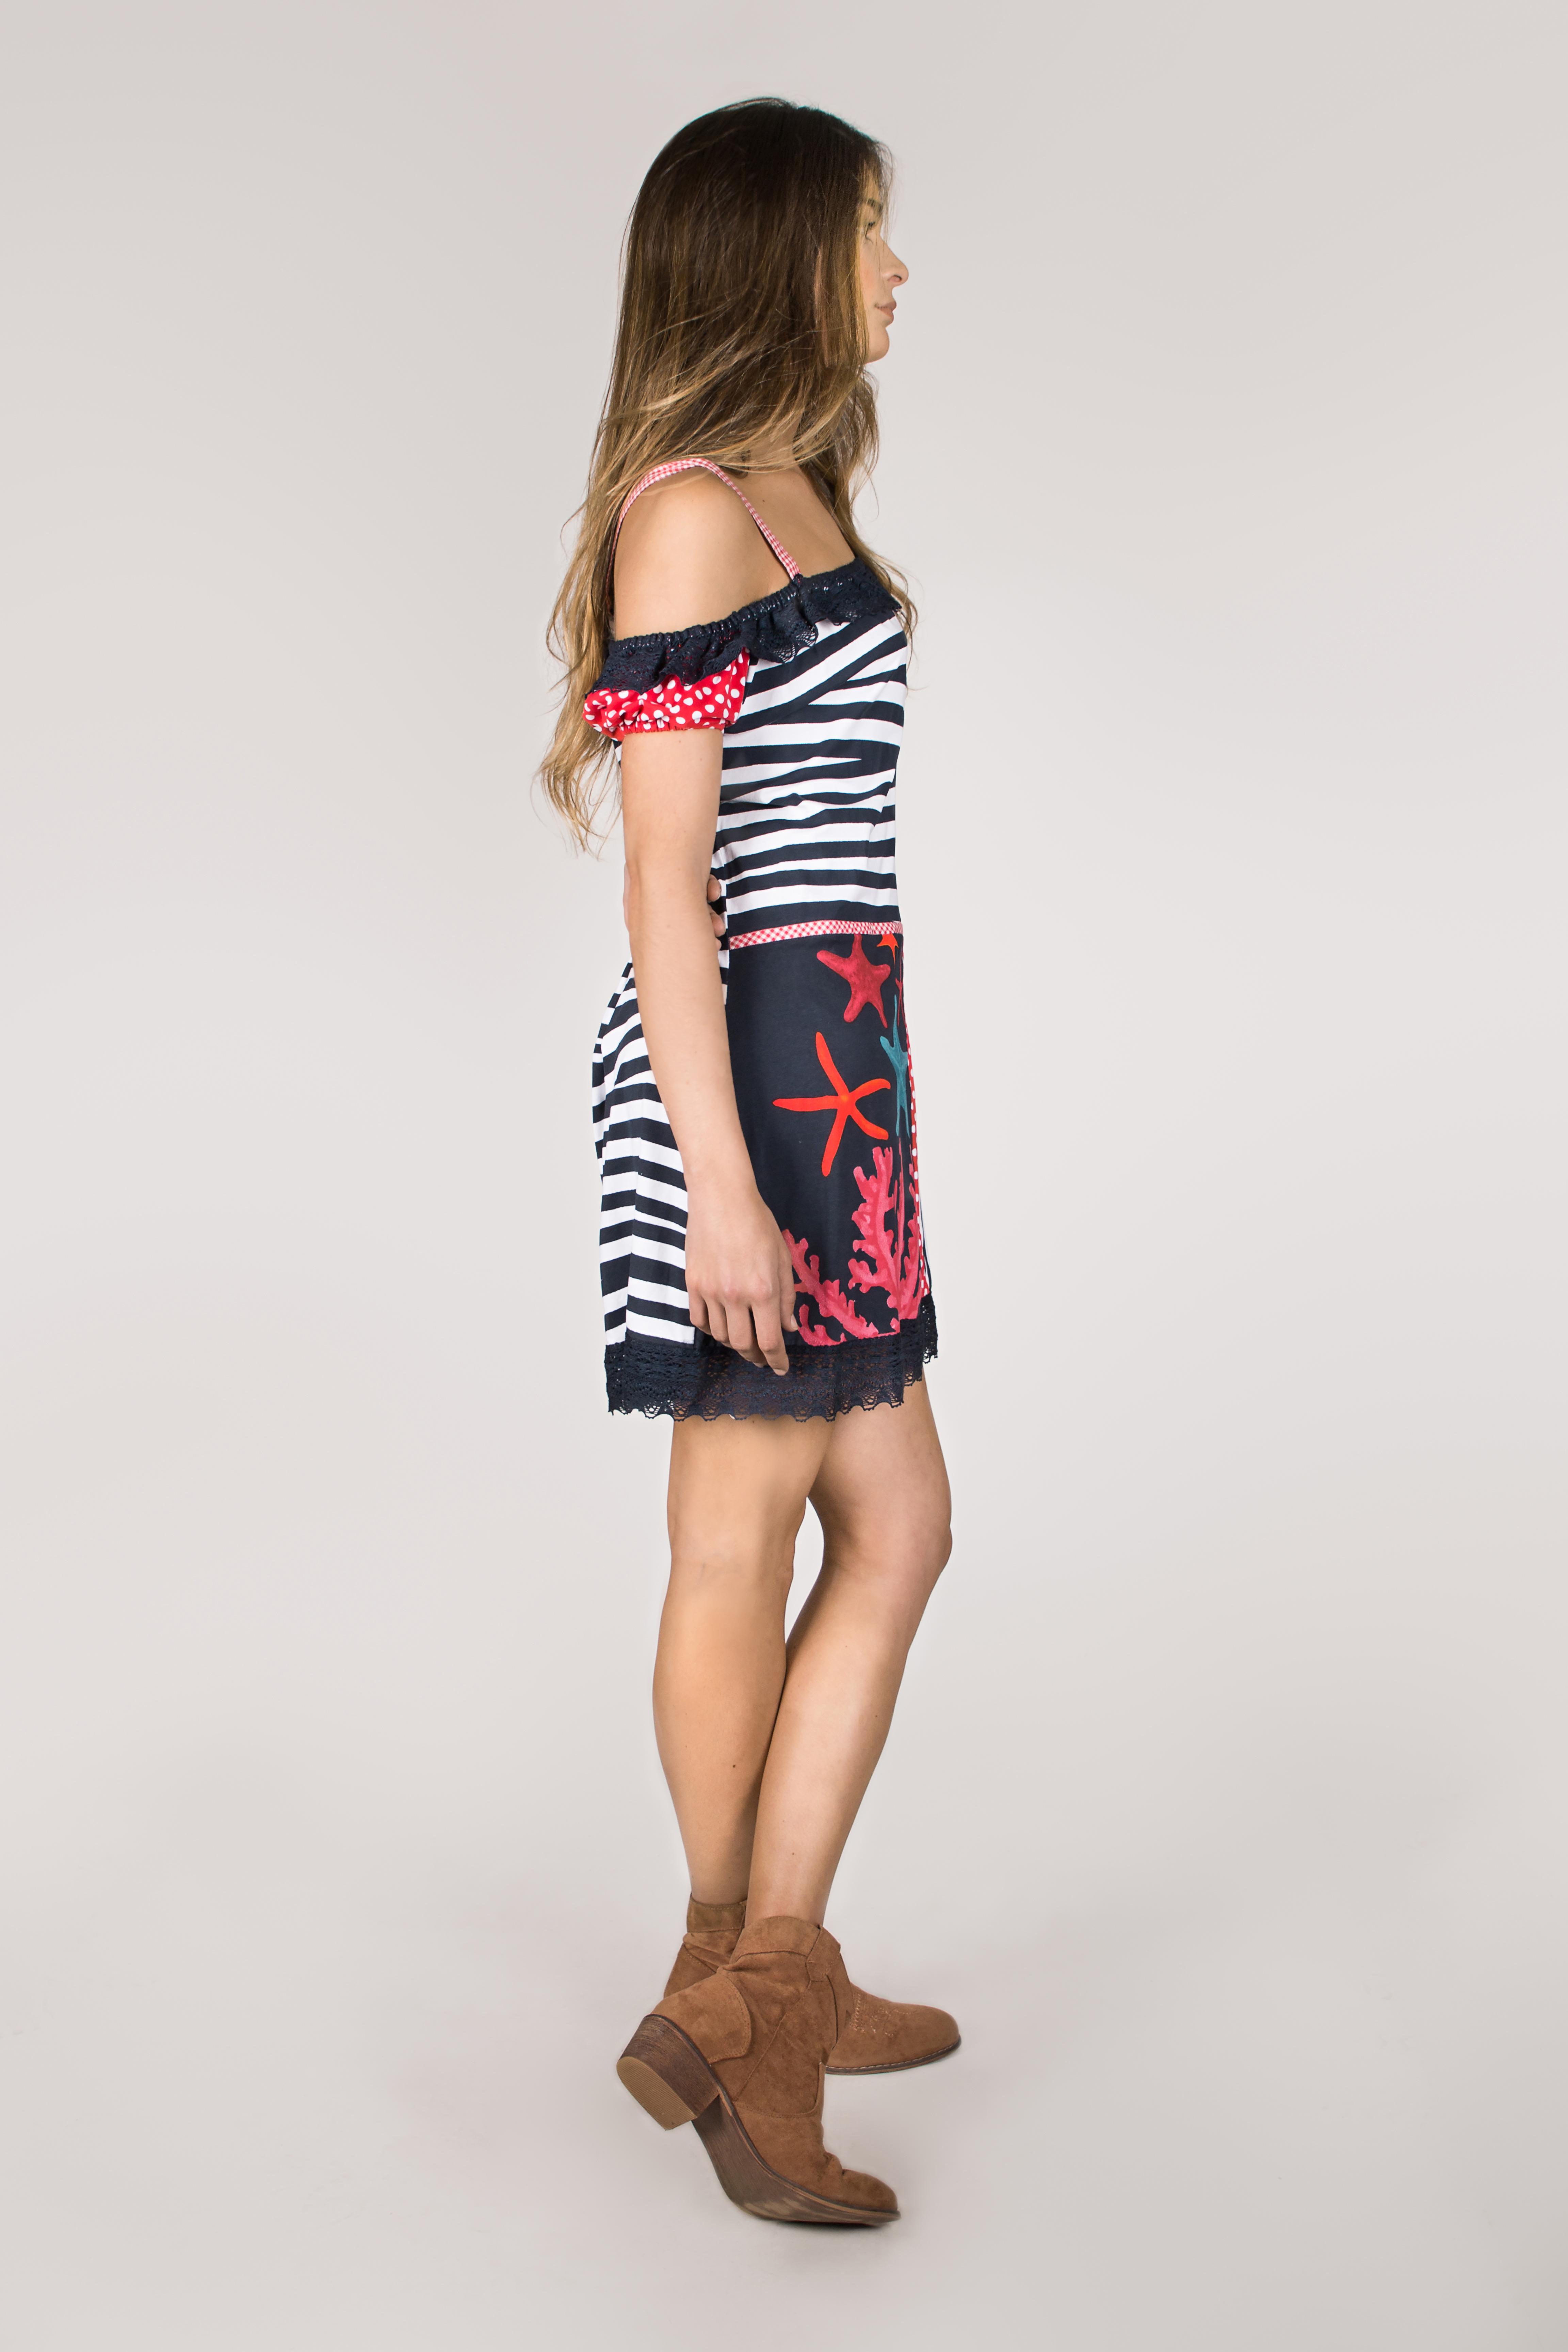 Shoklett Spain: Pink Coral Cotton Ruffled Short Dress Zoey